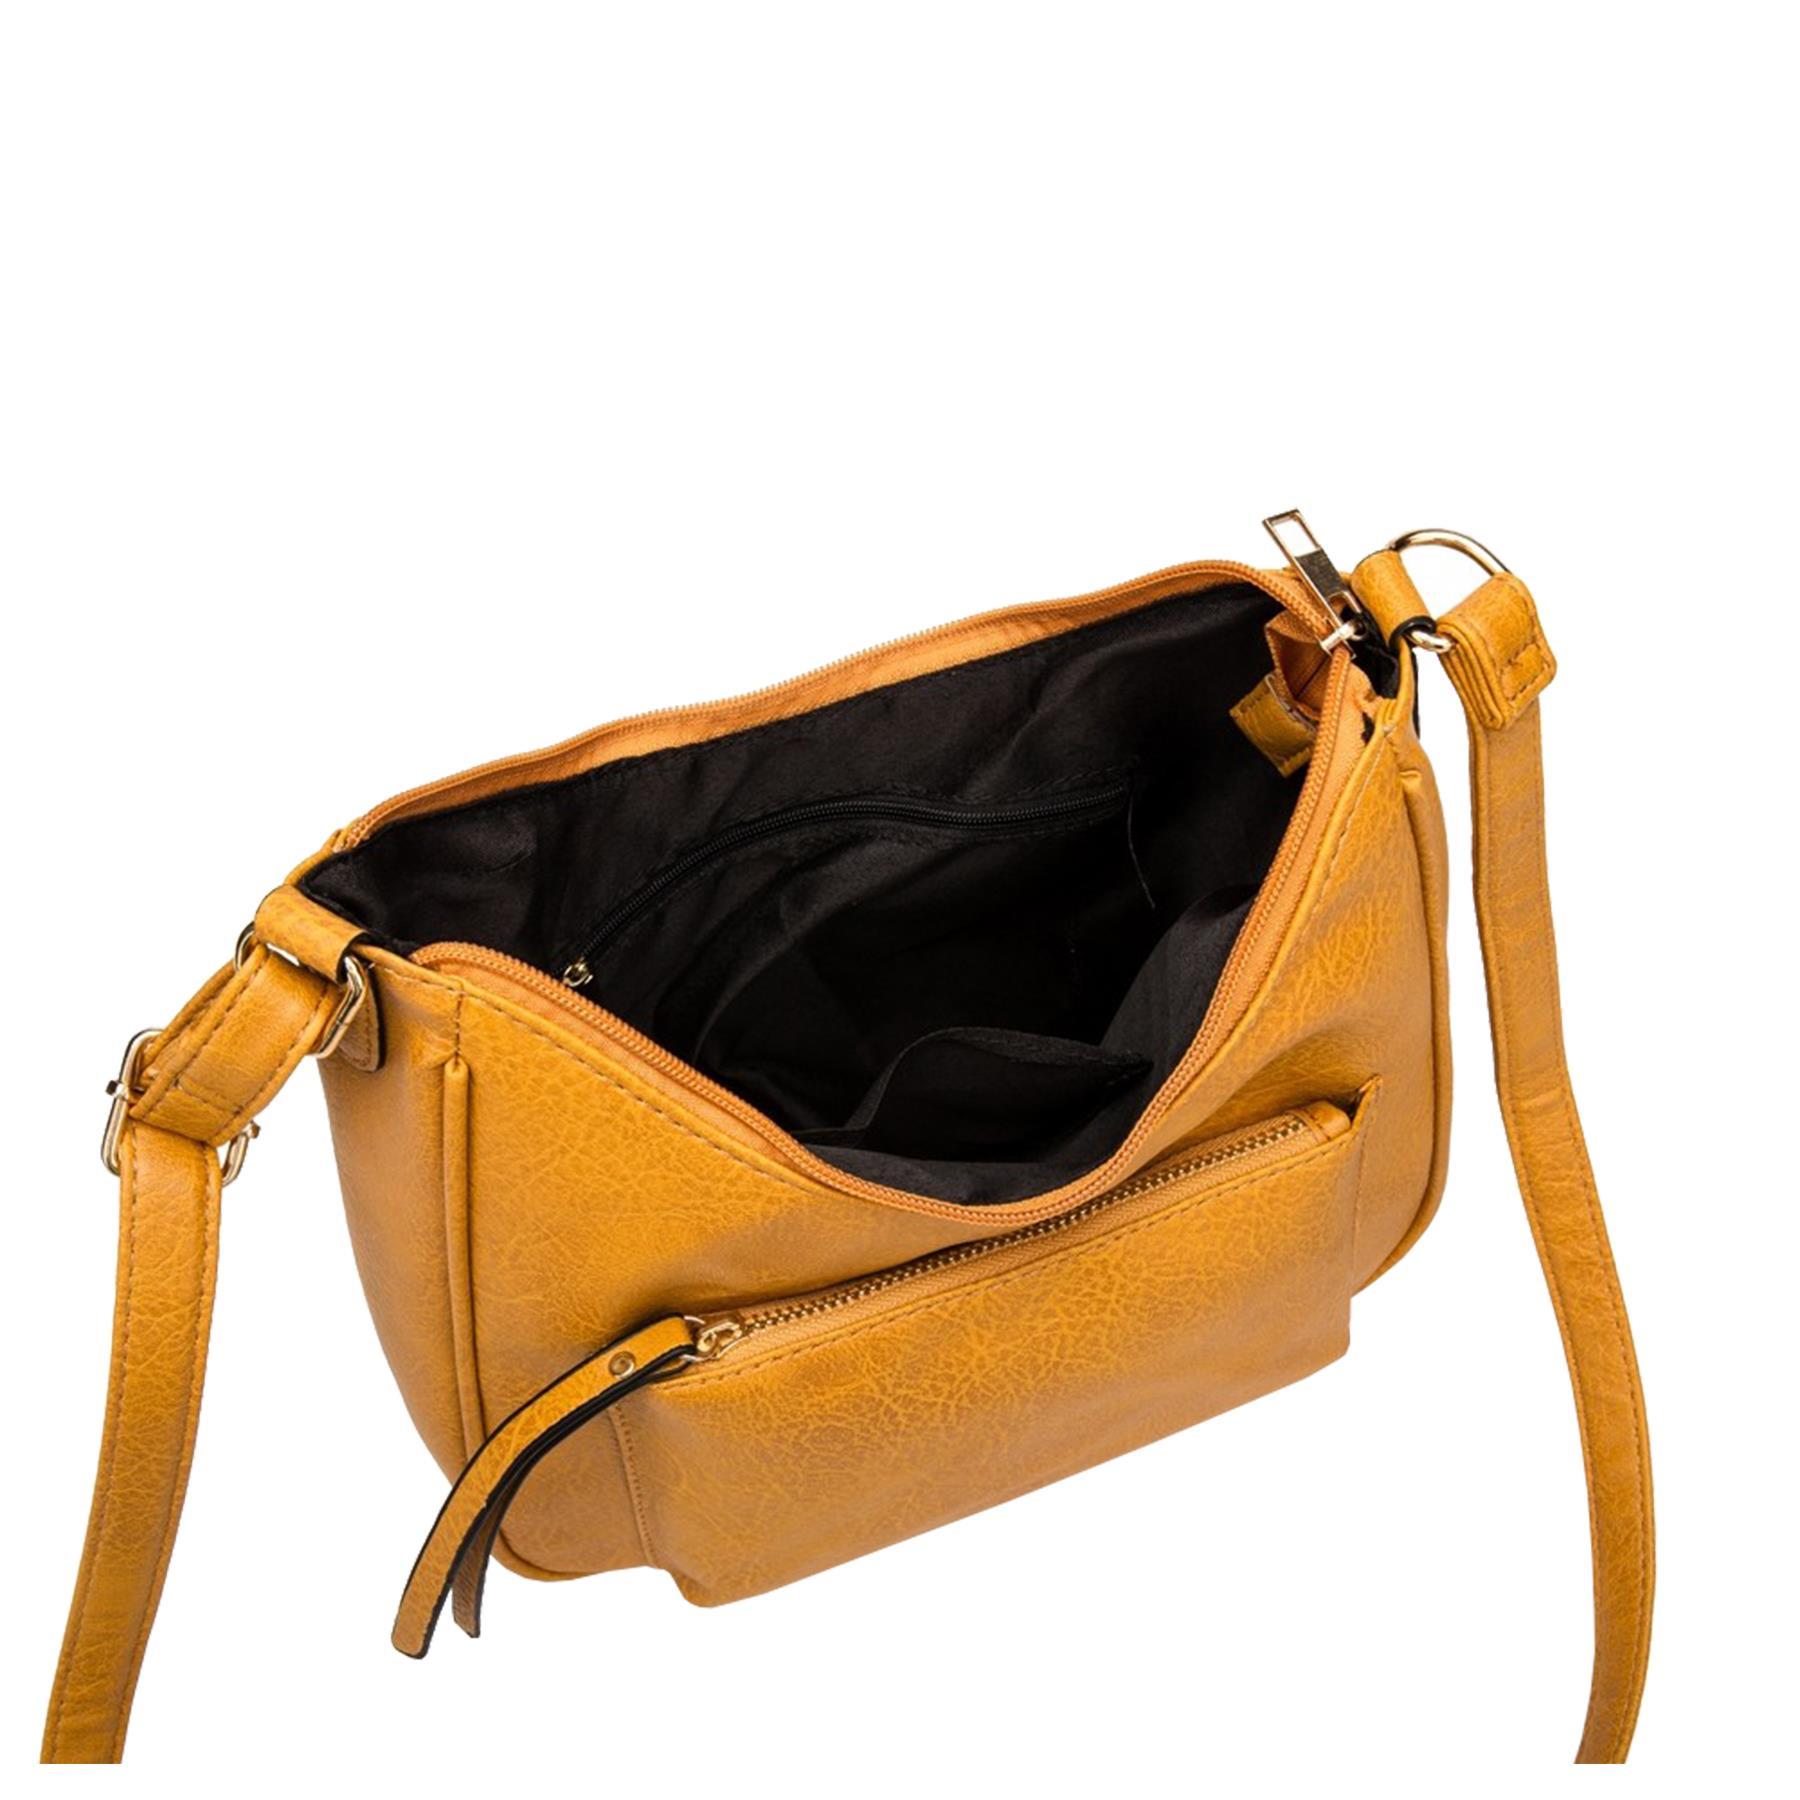 New-Soft-Synthetic-Leather-Front-Pocket-Ladies-Casual-Crossbody-Bag-Handbag thumbnail 13